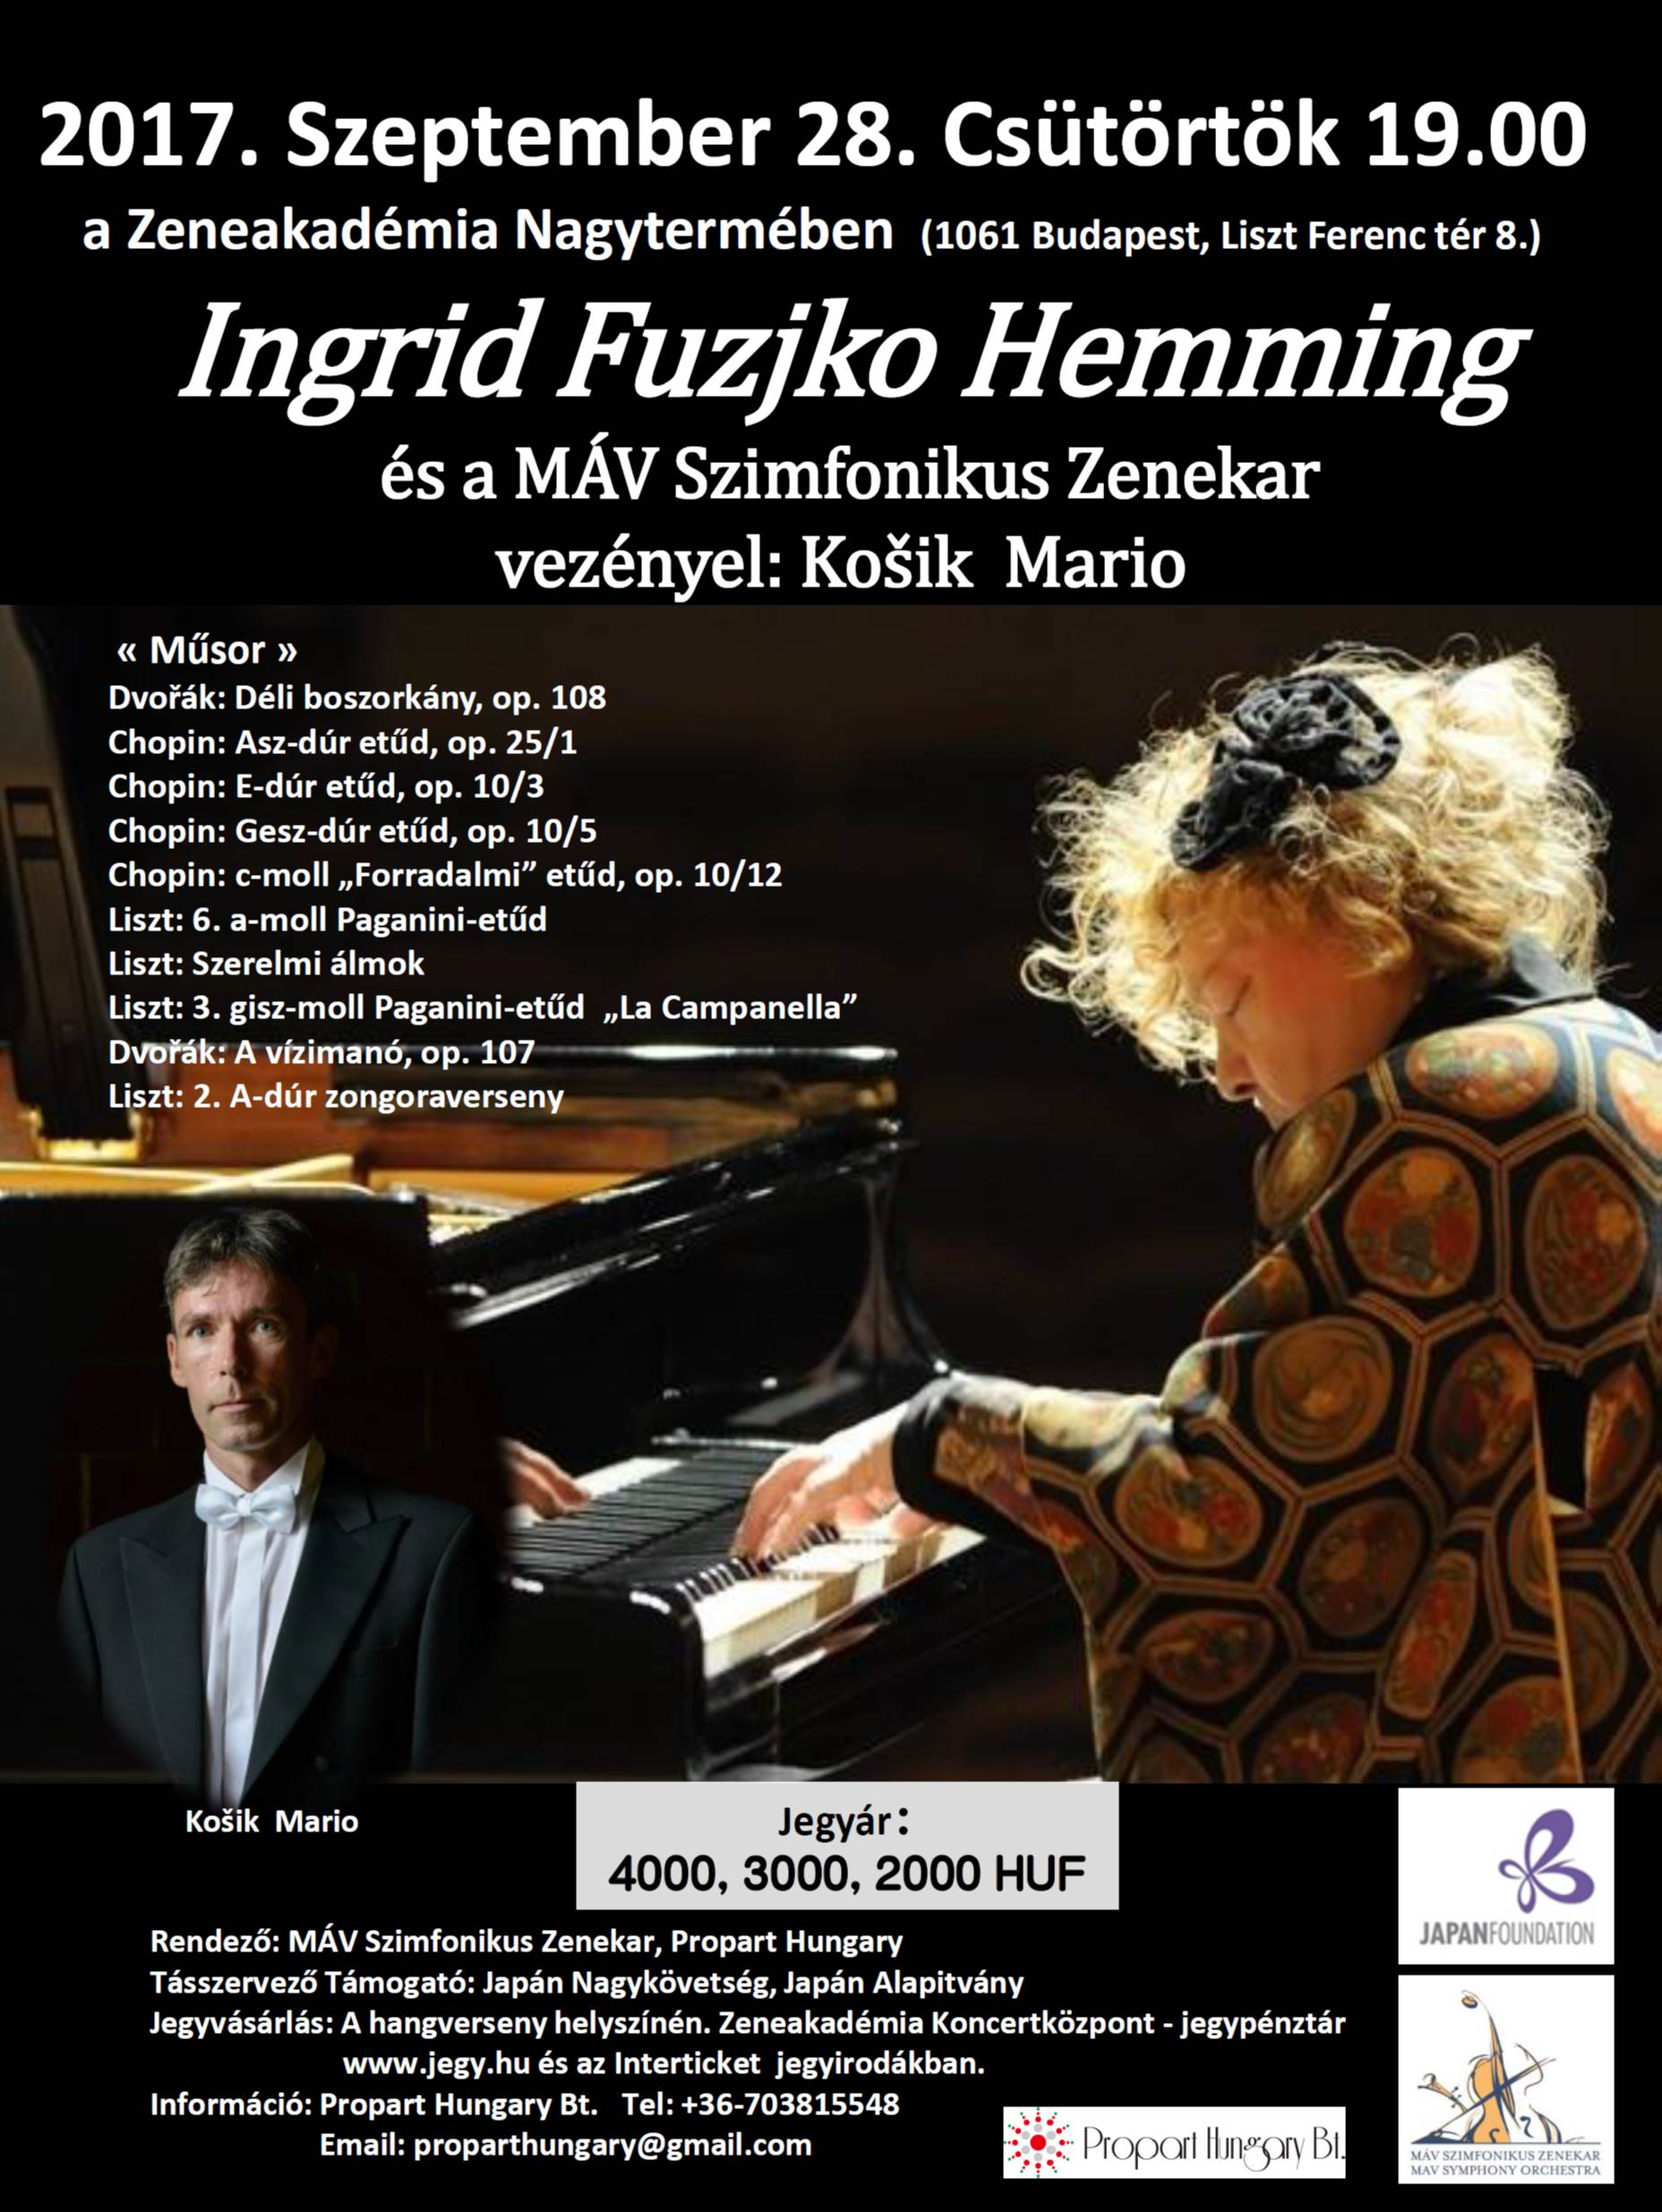 FuzjkoHemmingkoncert2017HU